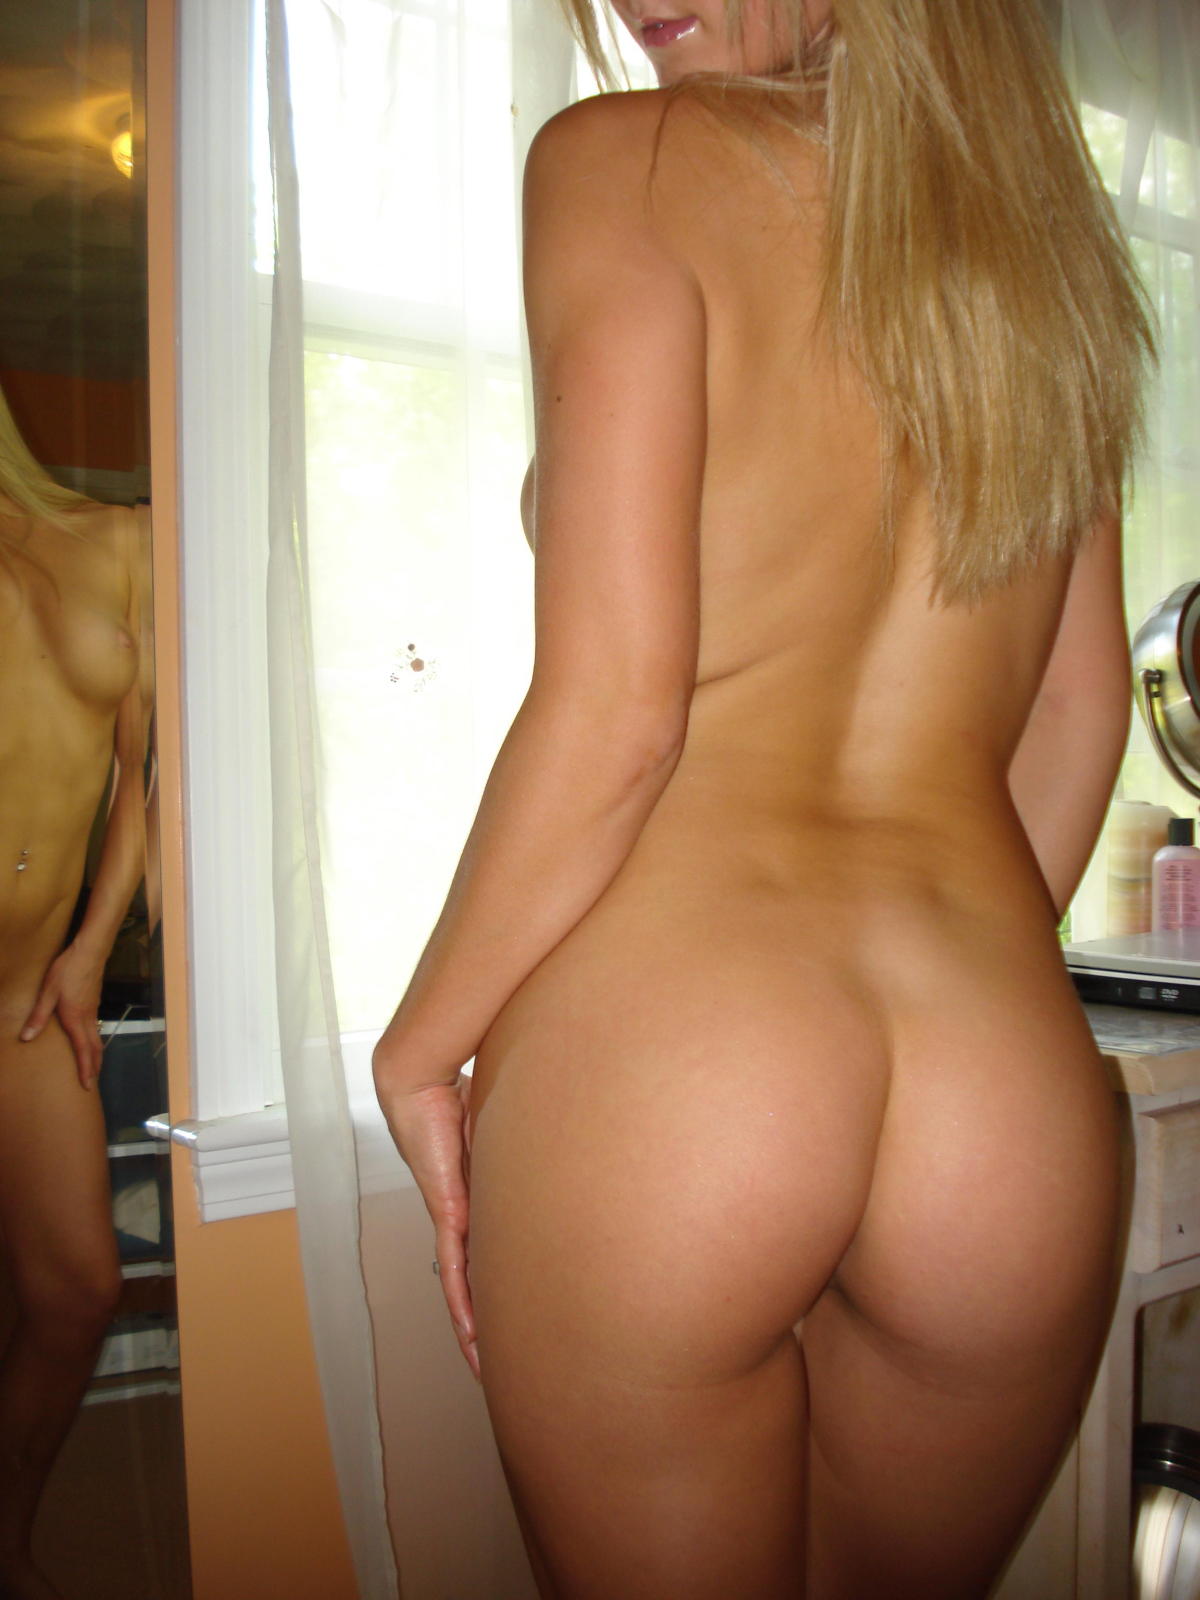 blonde-nude-ex-girlfriend-jeans-skirt-amateur-girl-27